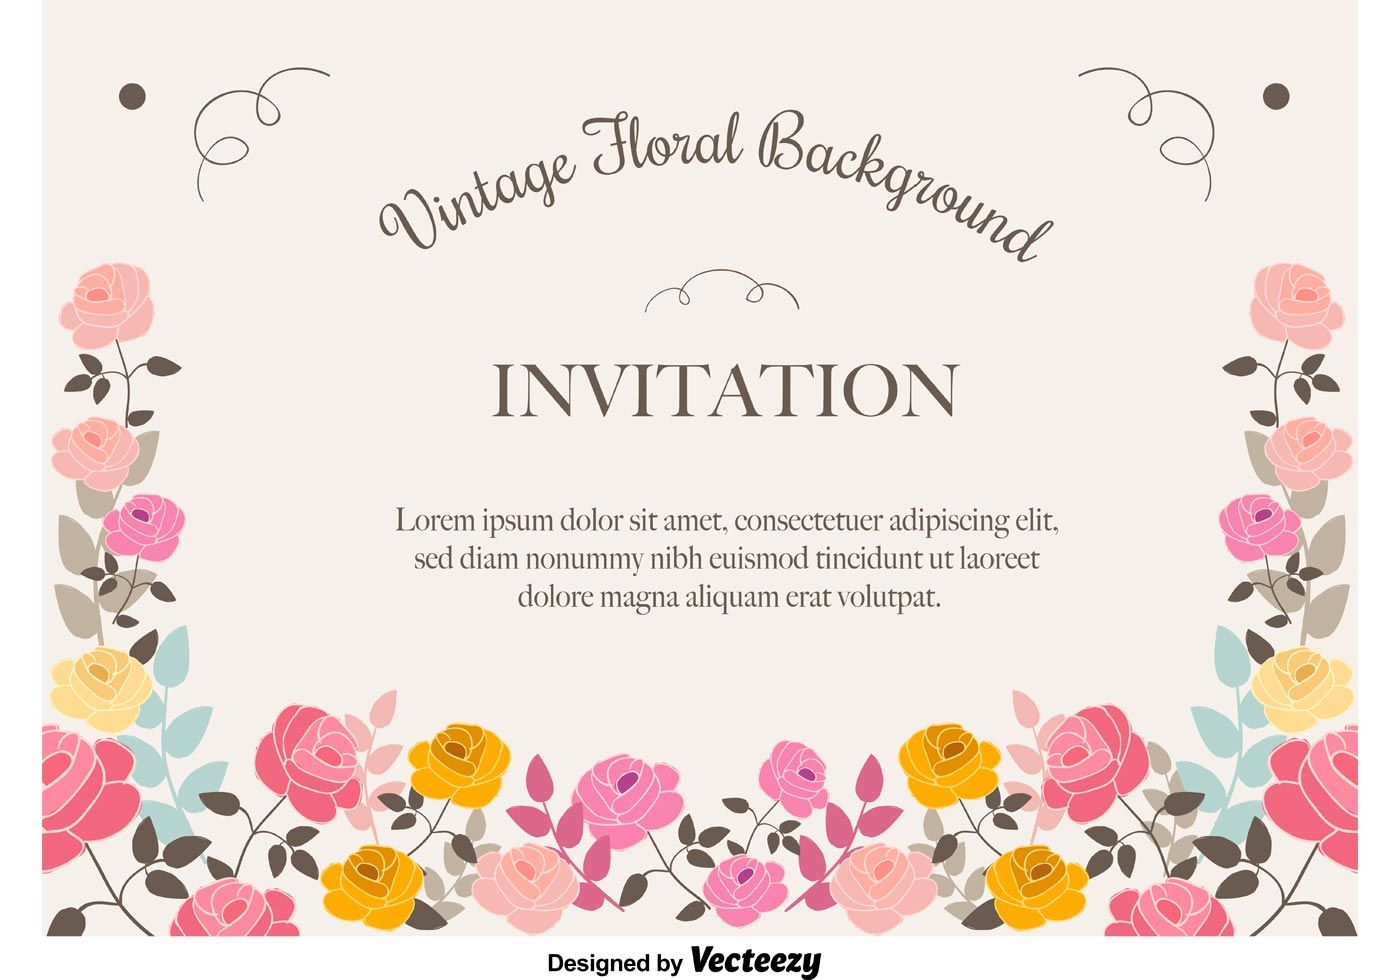 Floral invitation background vector pinterest floral 01f3e66effc24c468fb2c3339bcbb892g stopboris Gallery